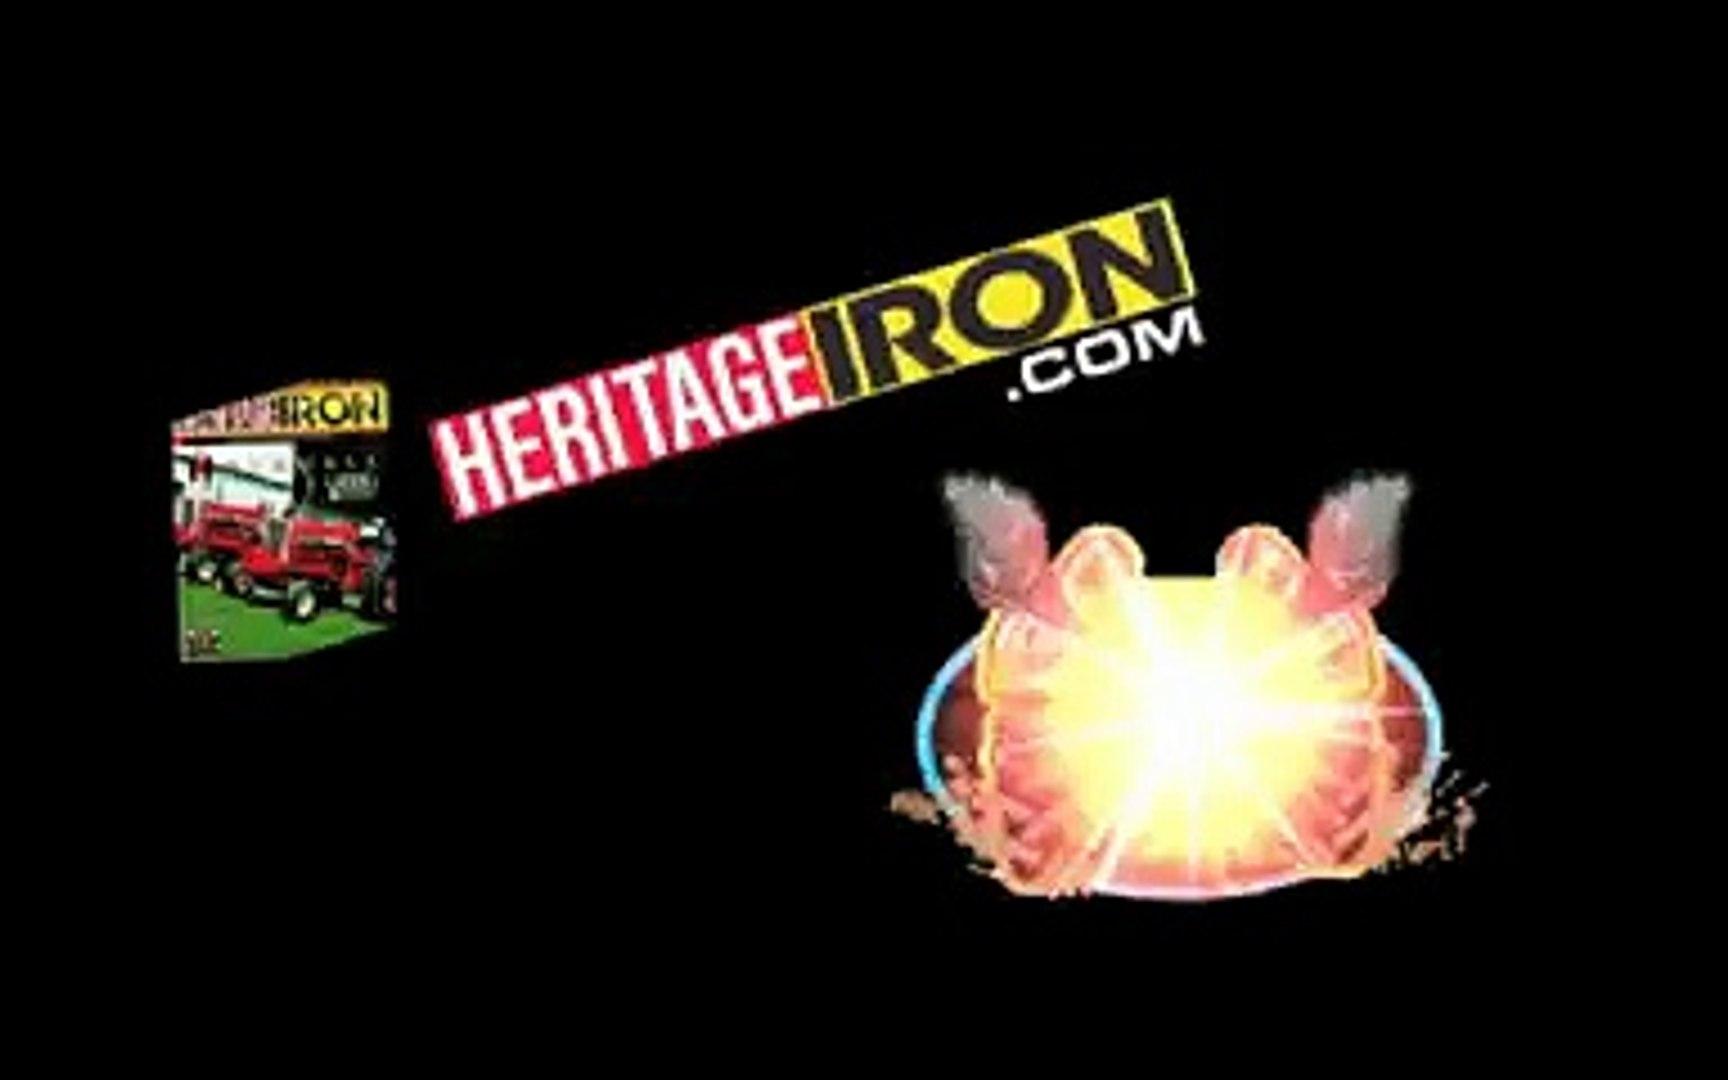 HERITAGE IRON